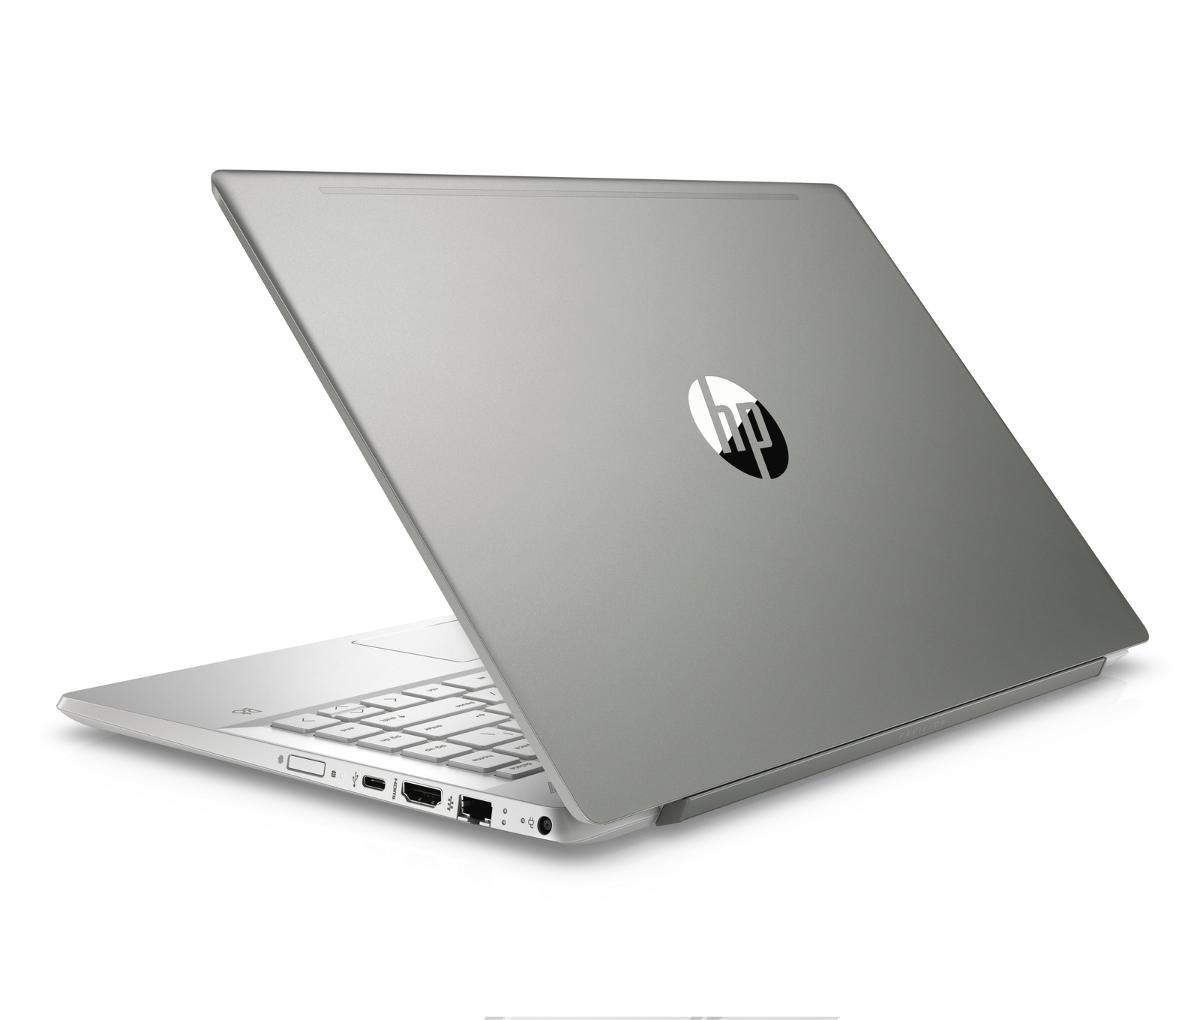 "Laptop HP Pavilion 14-ce0011nw 4TZ17EA, i5-8250U, 8 GB RAM, 14"", 256 GB SSD, Windows 10 Home"